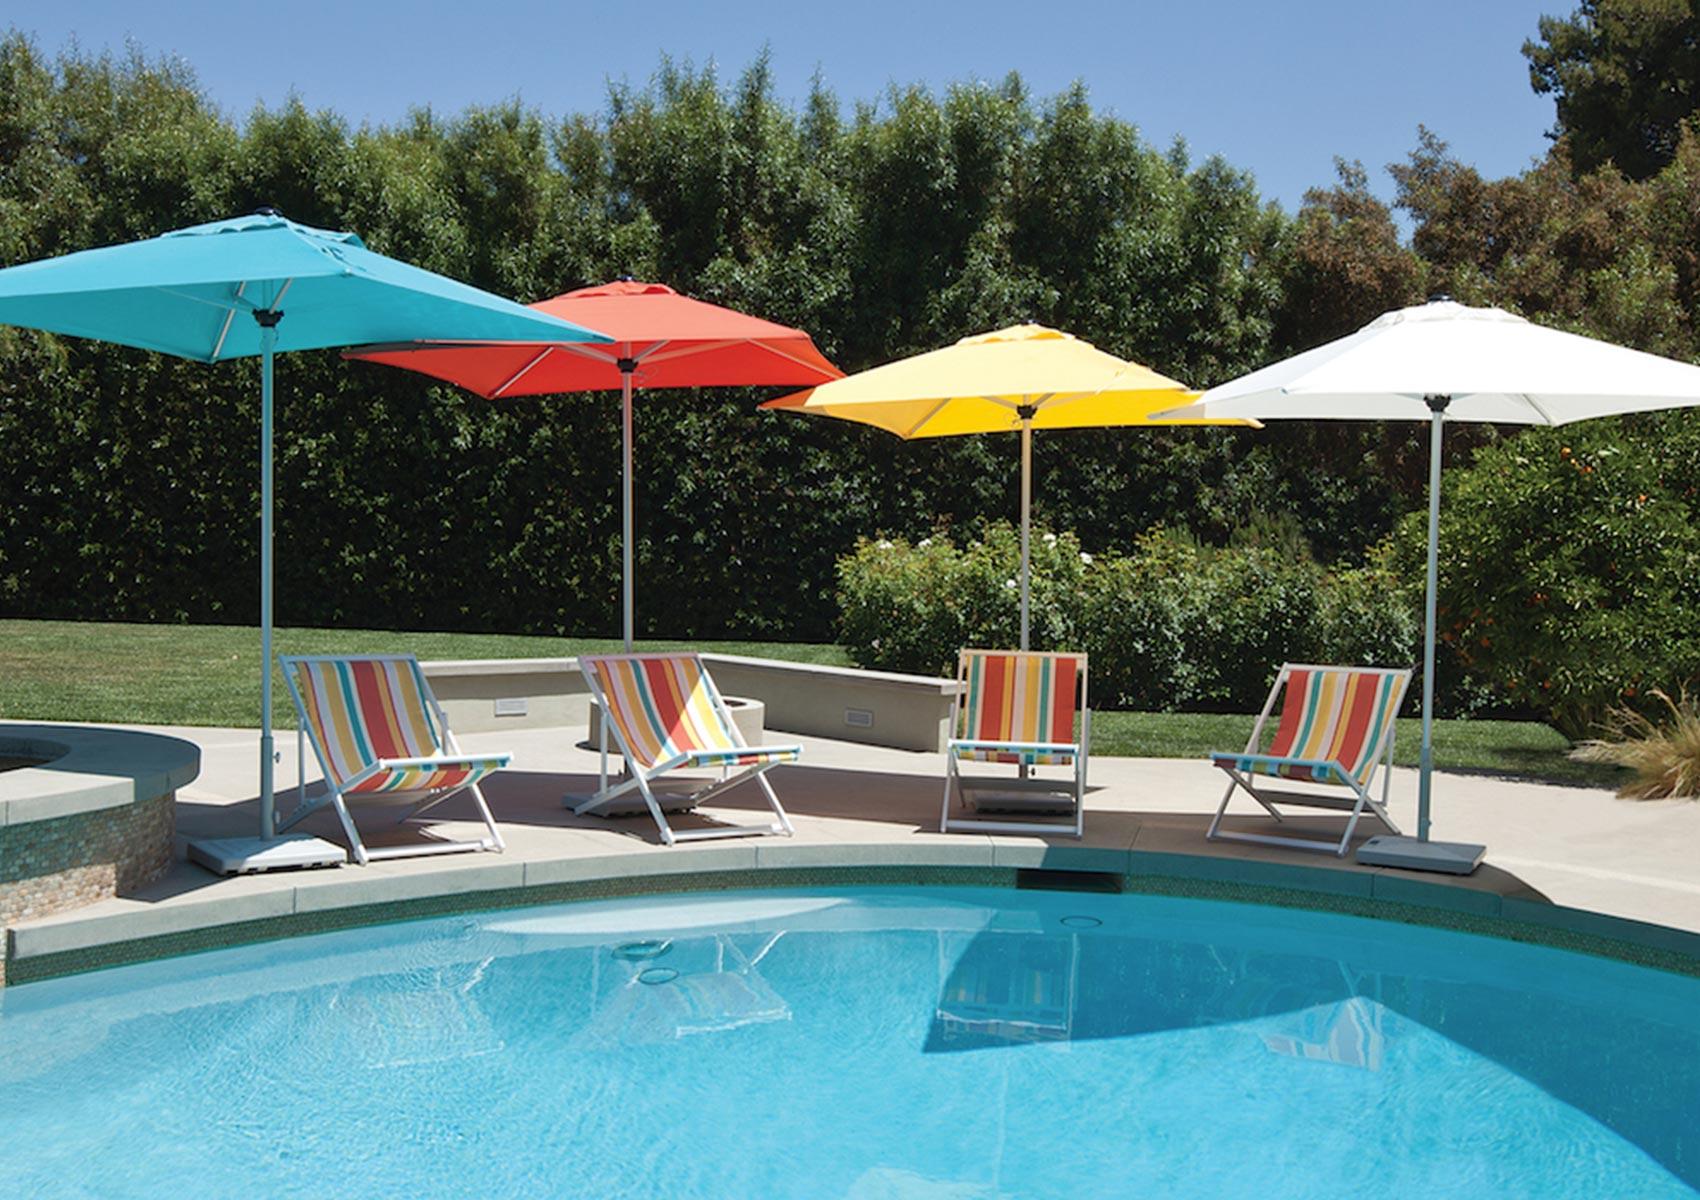 38ff5da8c1c9 Shop Patio & Pool Umbrellas in Langley   BC Home Leisure